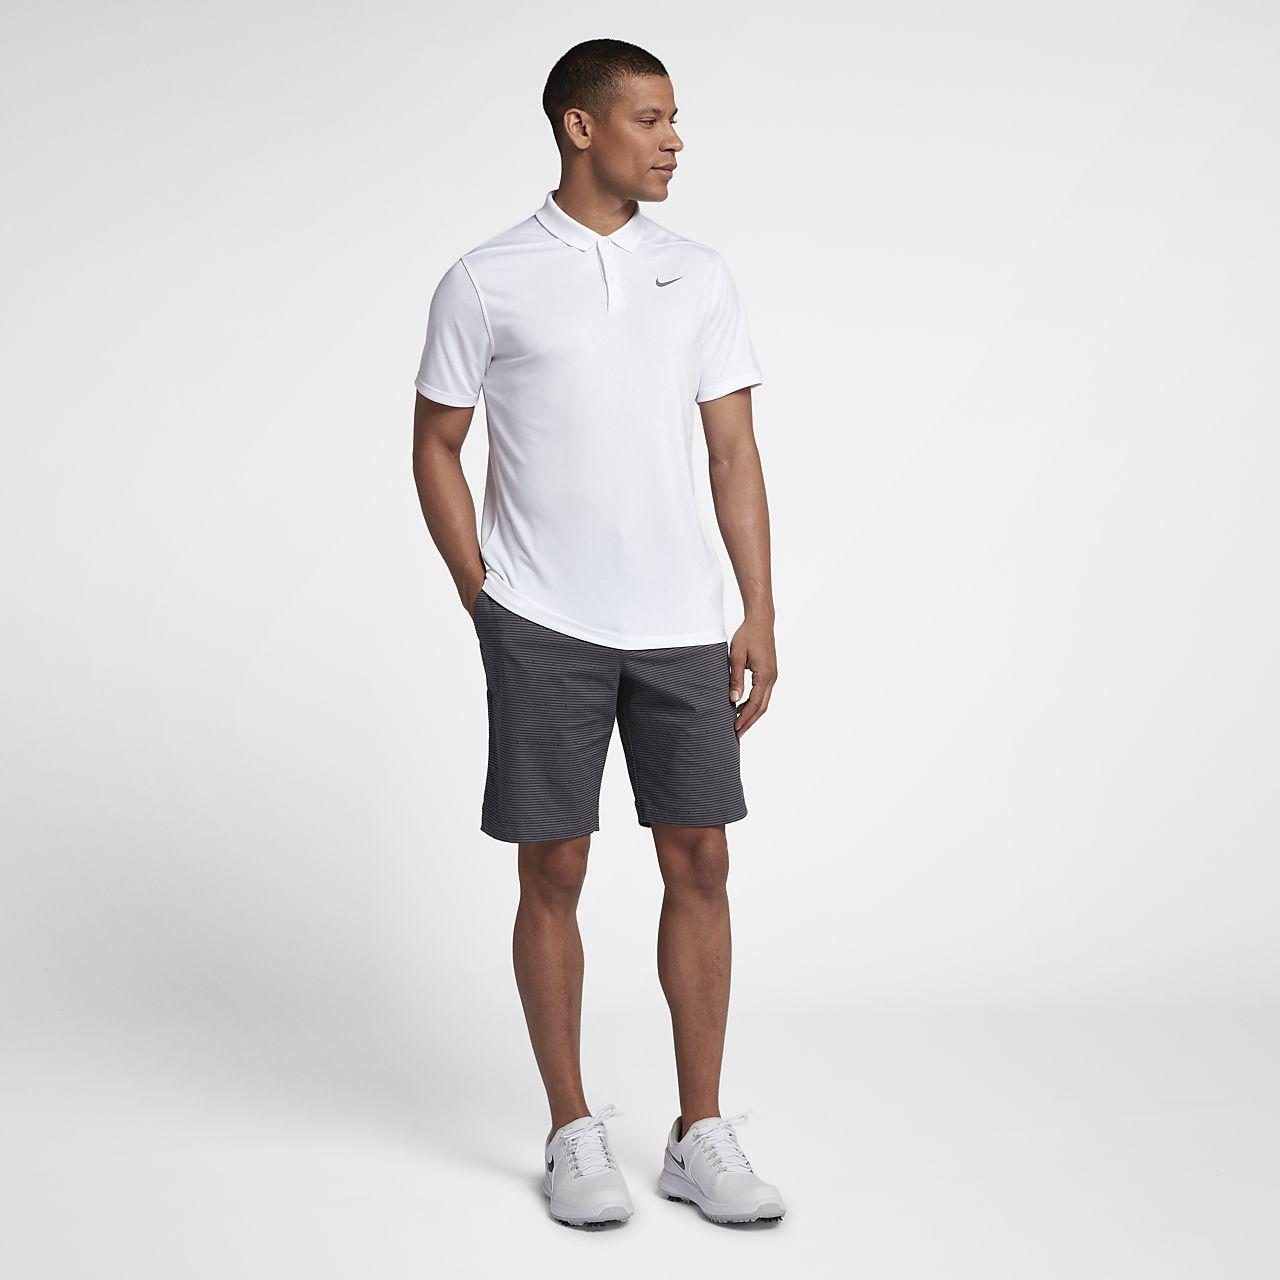 cc4be1300f71e Nike Dri-FIT Victory Men s Slim-Fit Golf Polo. Nike.com GB